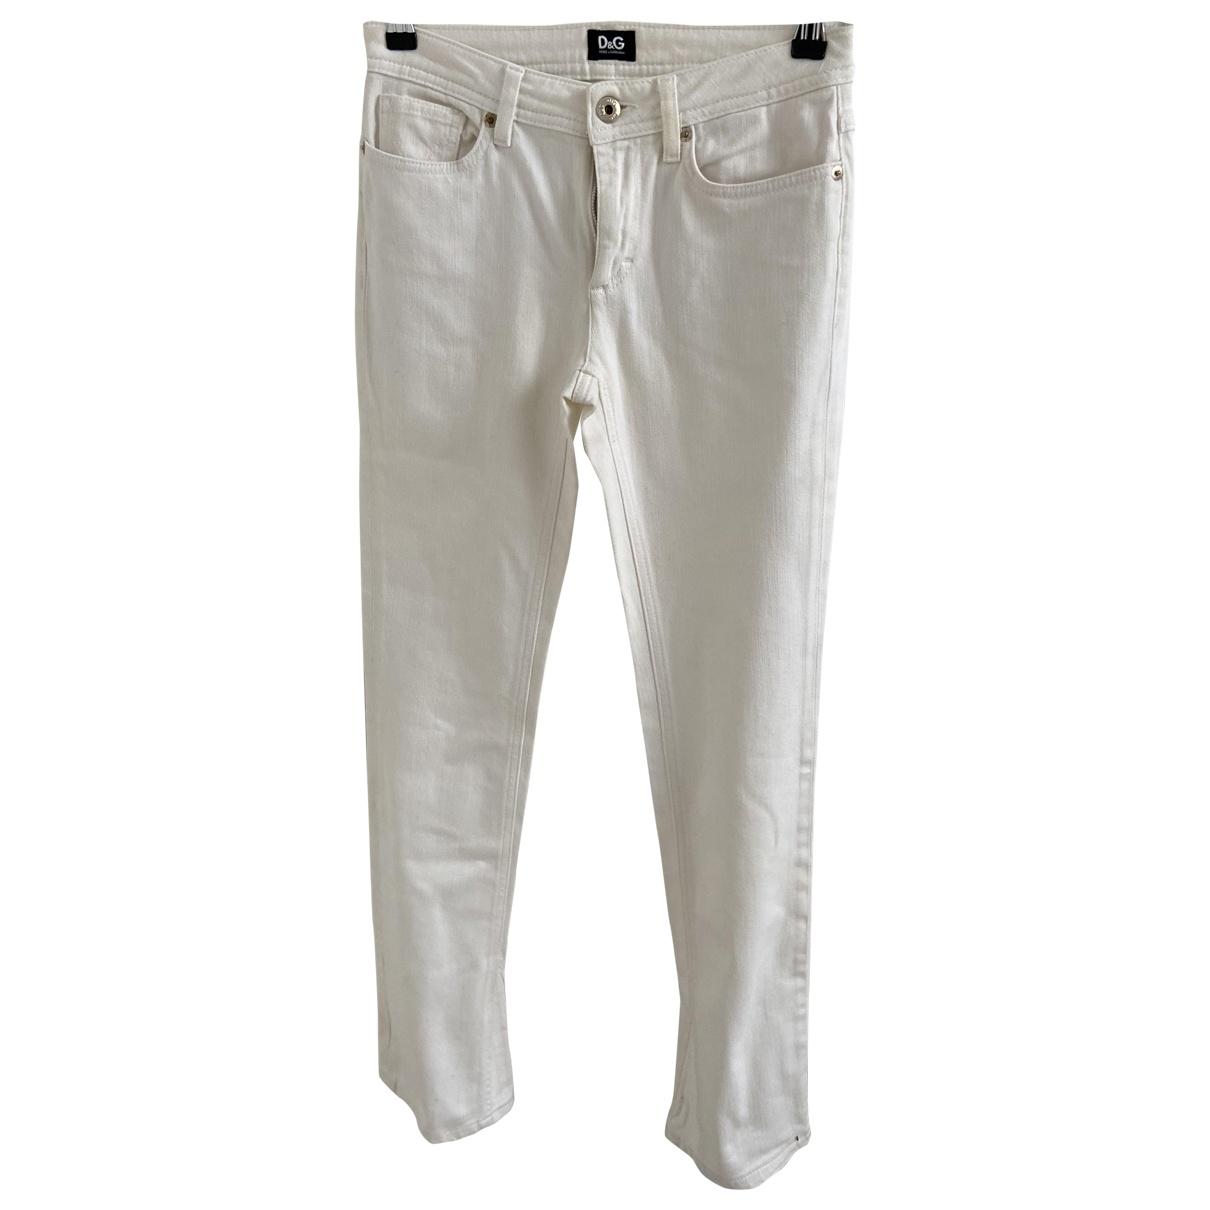 Pantalon largo D&g